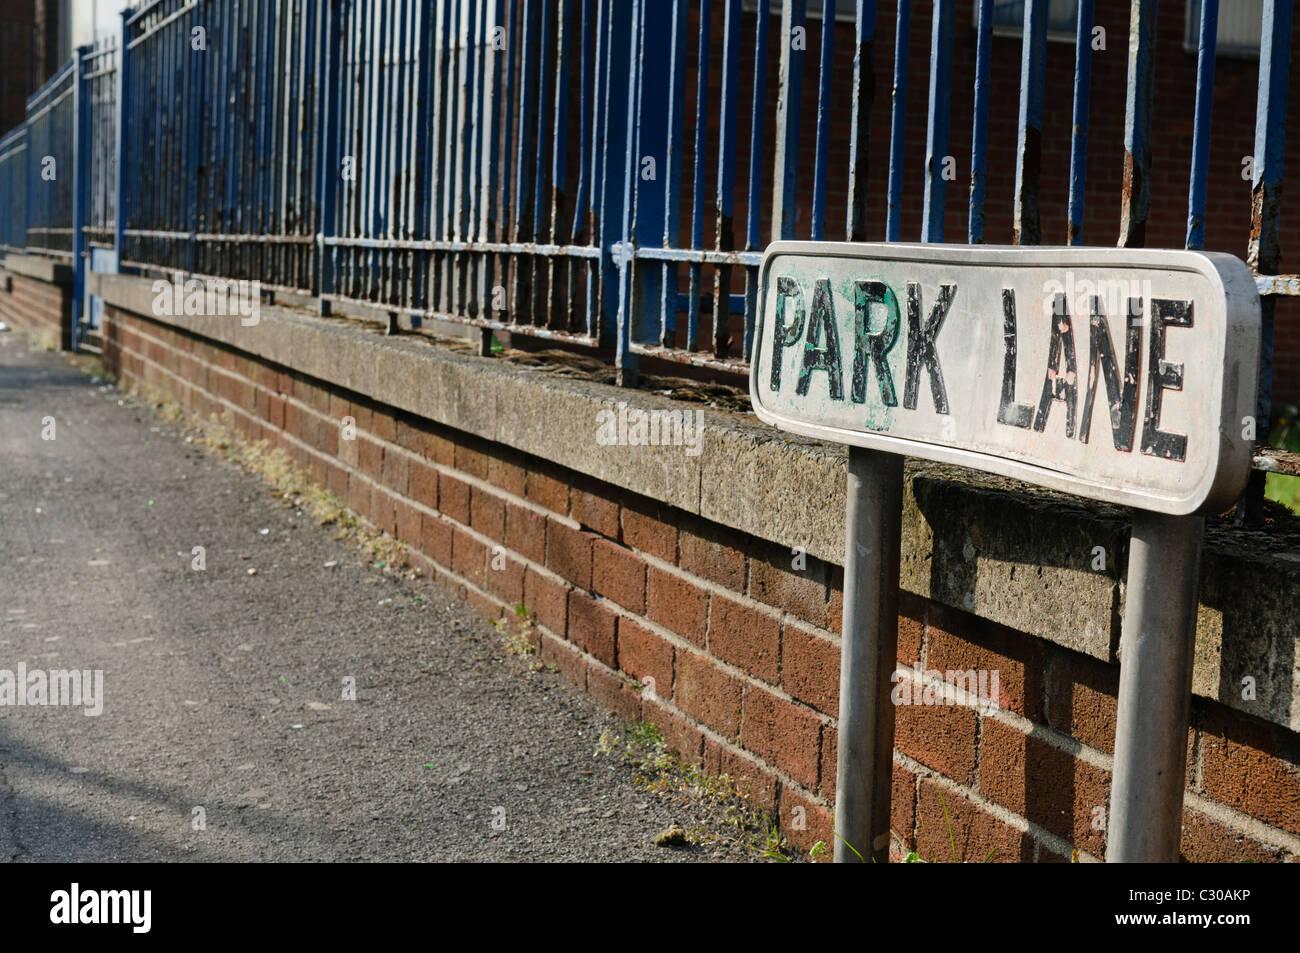 Señal de calle 'Park Lane' Foto de stock